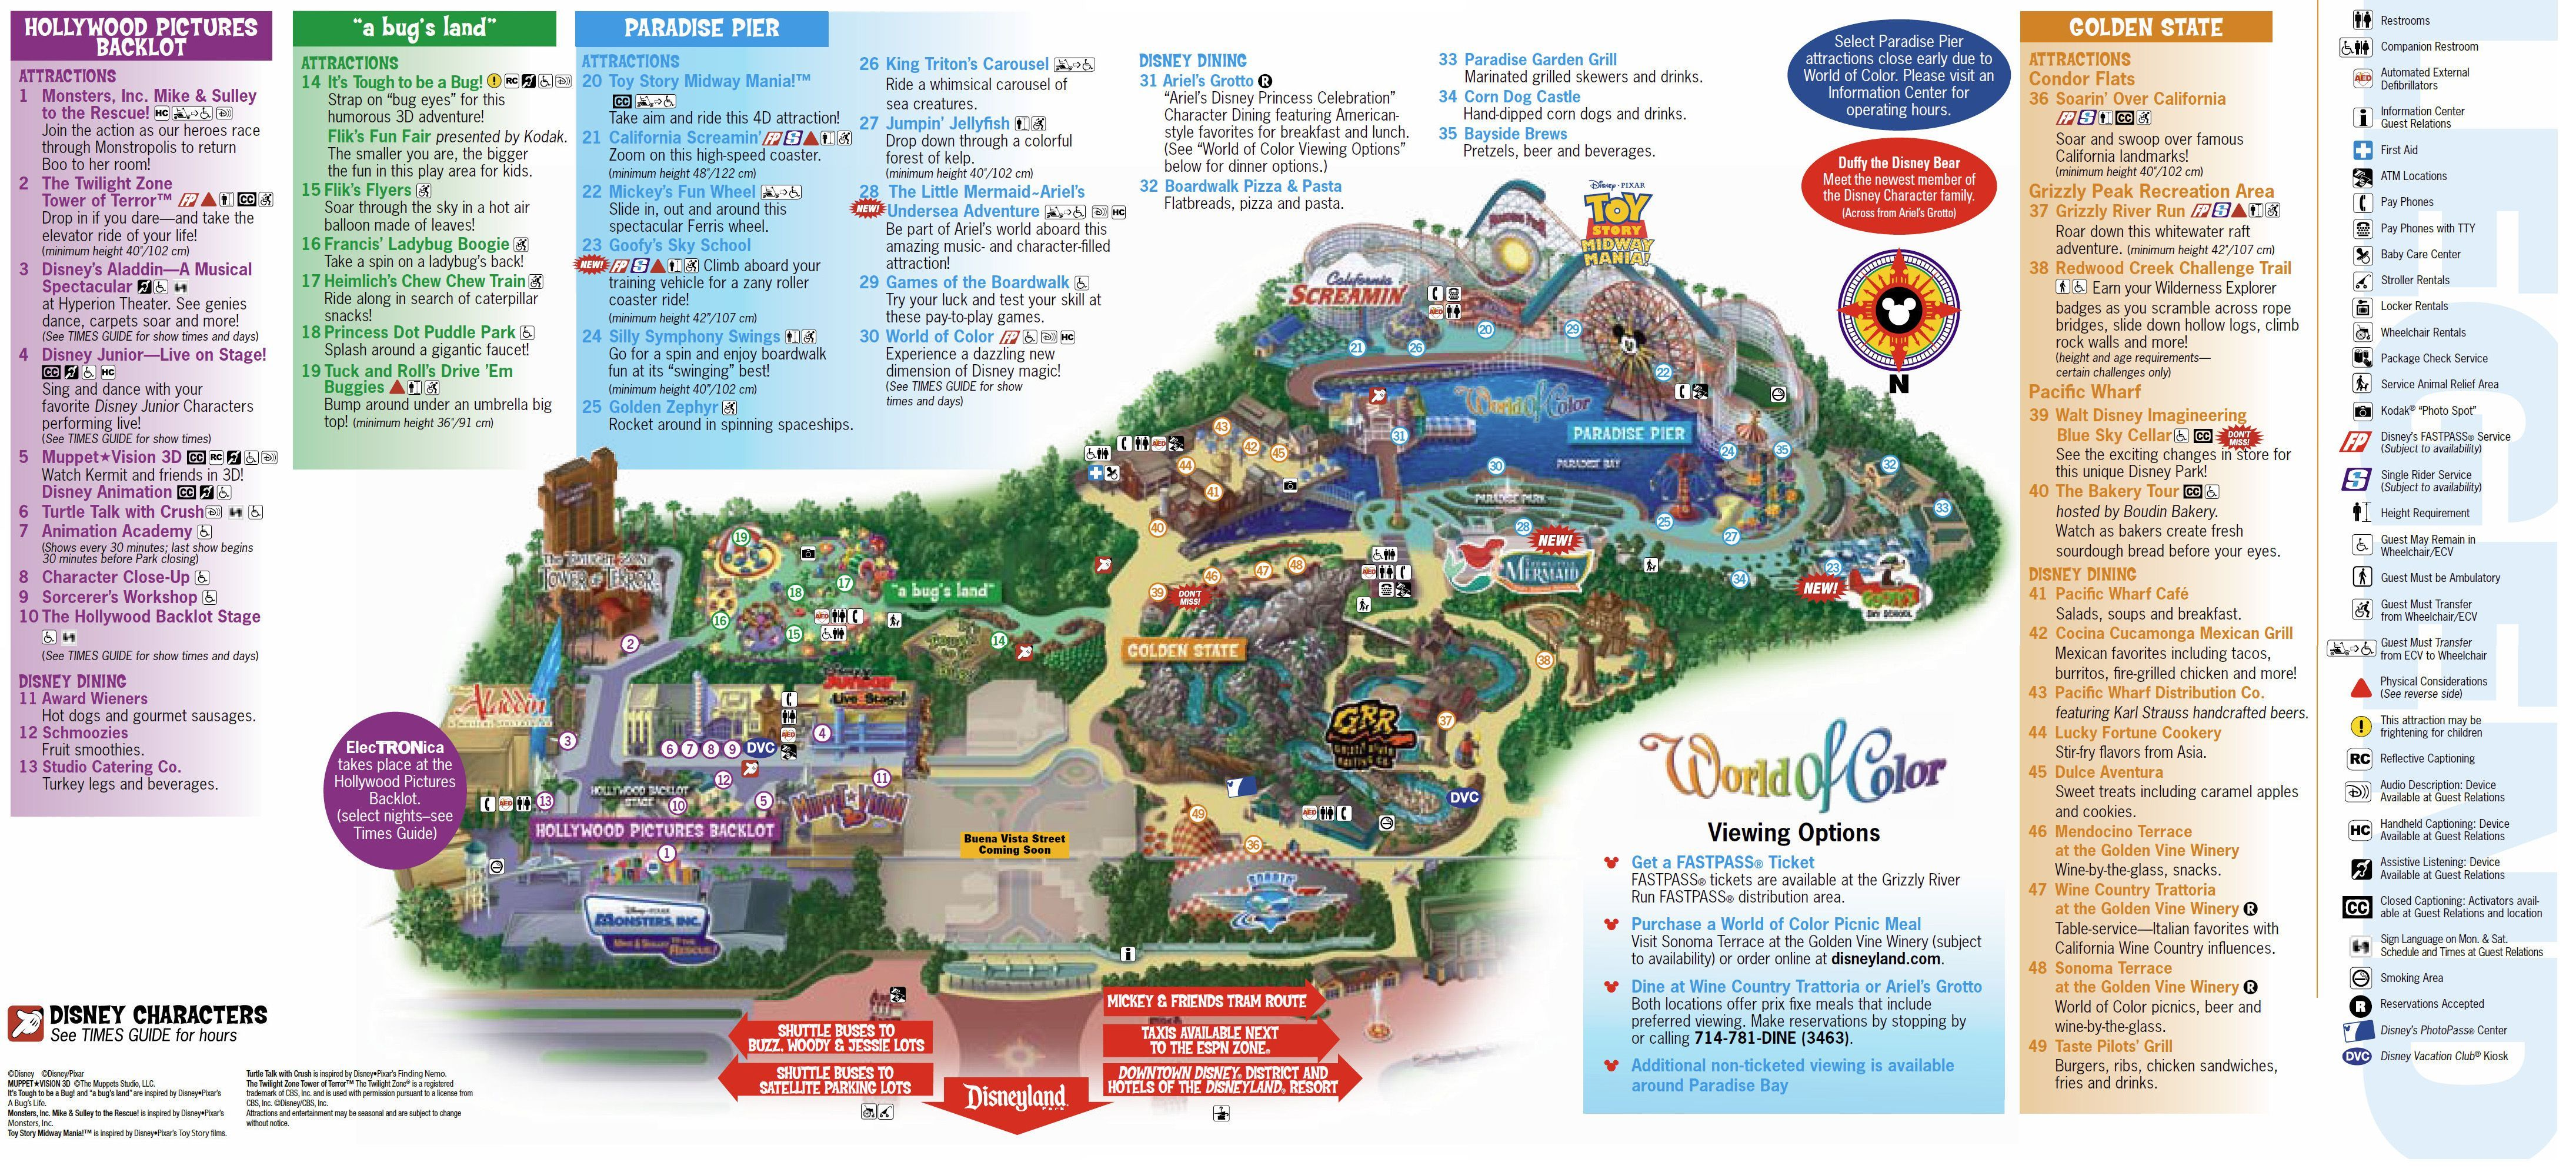 Disneyland Park Map Pdf 2018 – HD Wallpapers